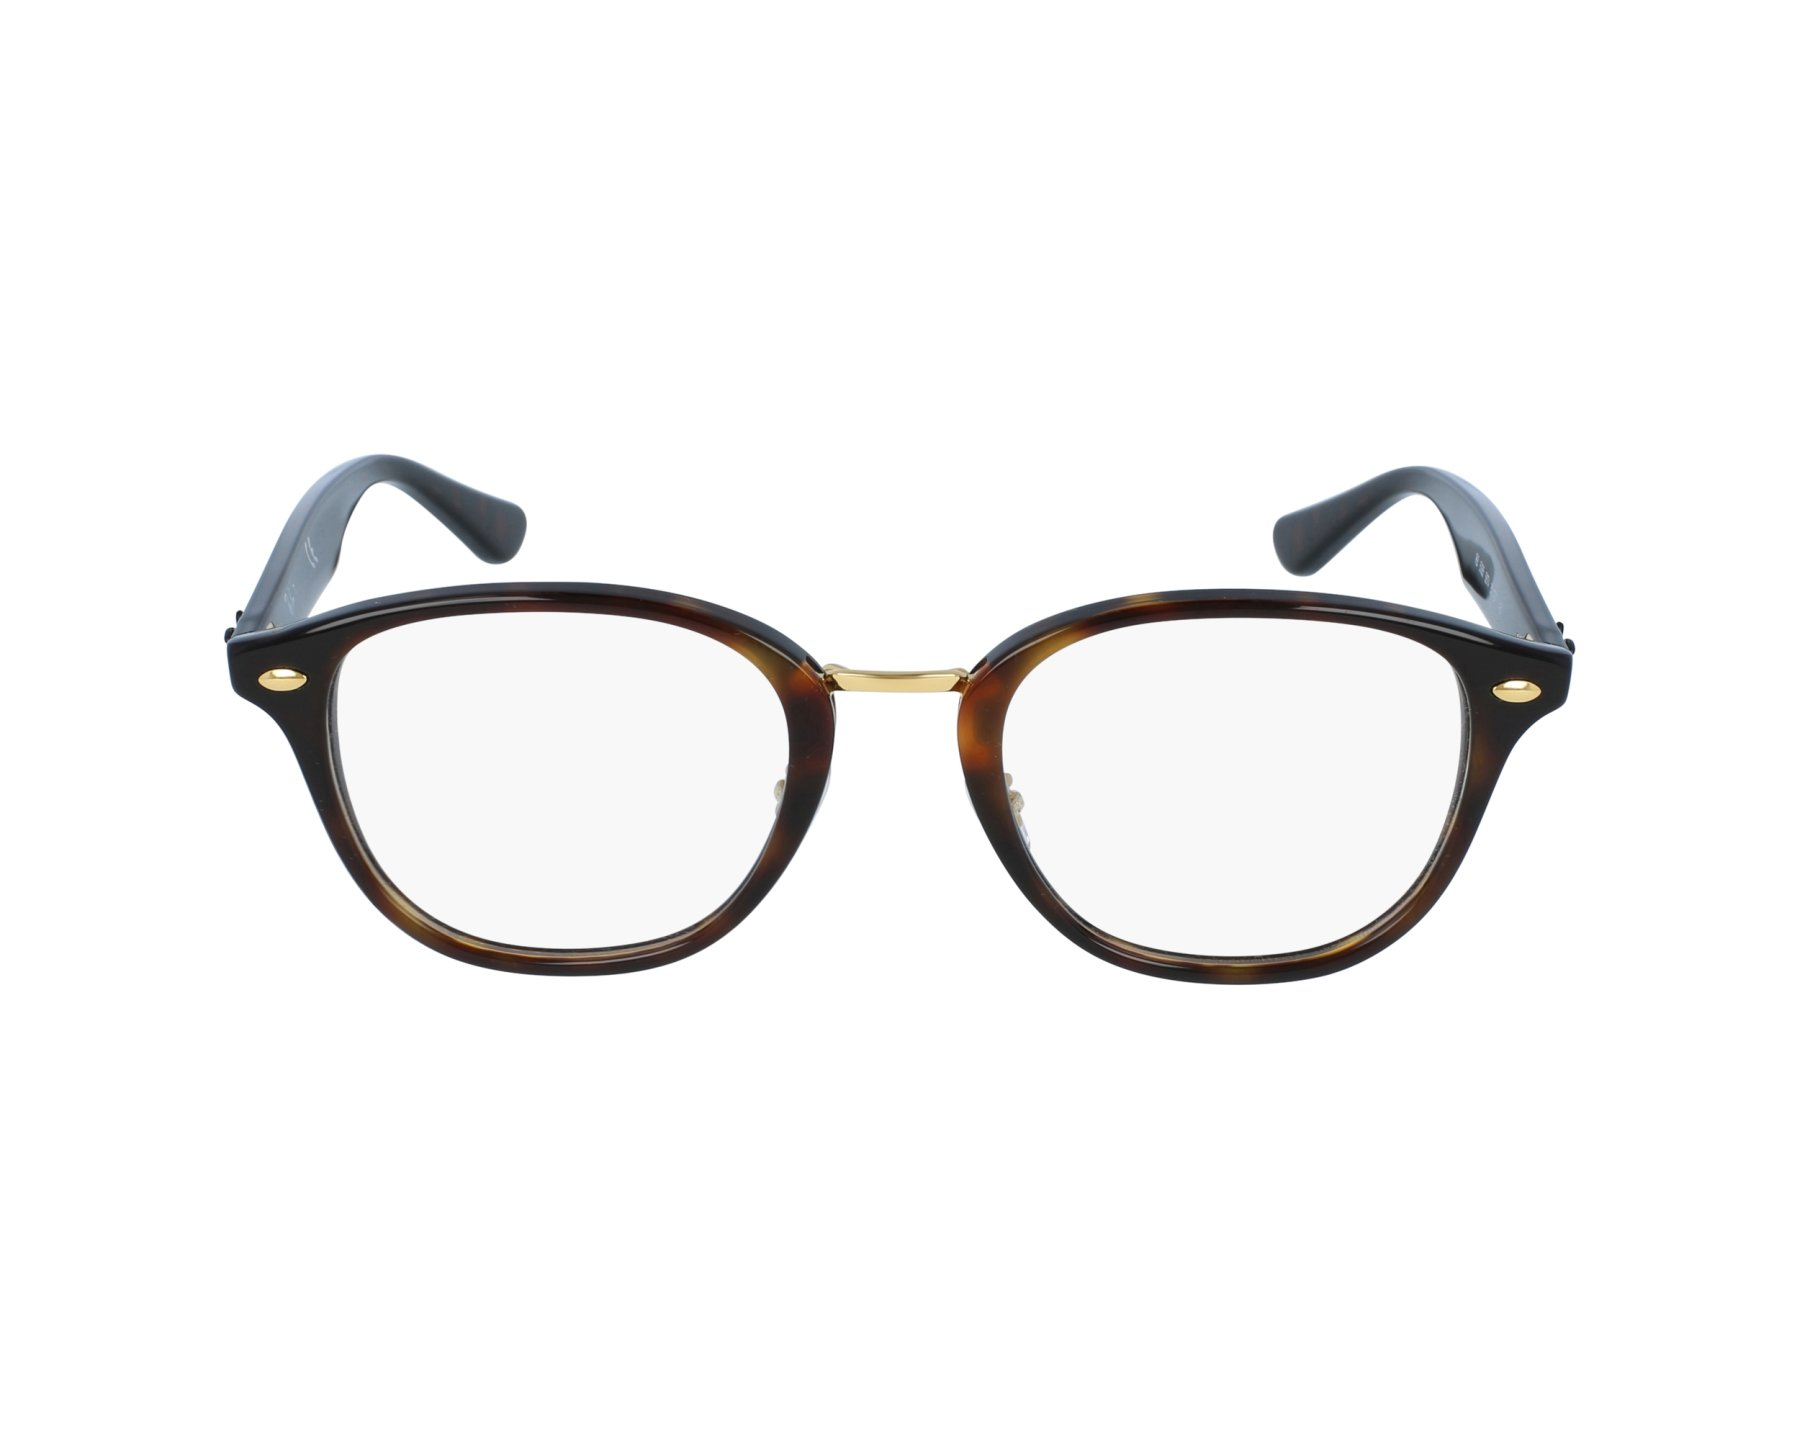 b5d16f1a8c262 eyeglasses Ray-Ban RX-5355 5674 48-21 Havana Brown profile view